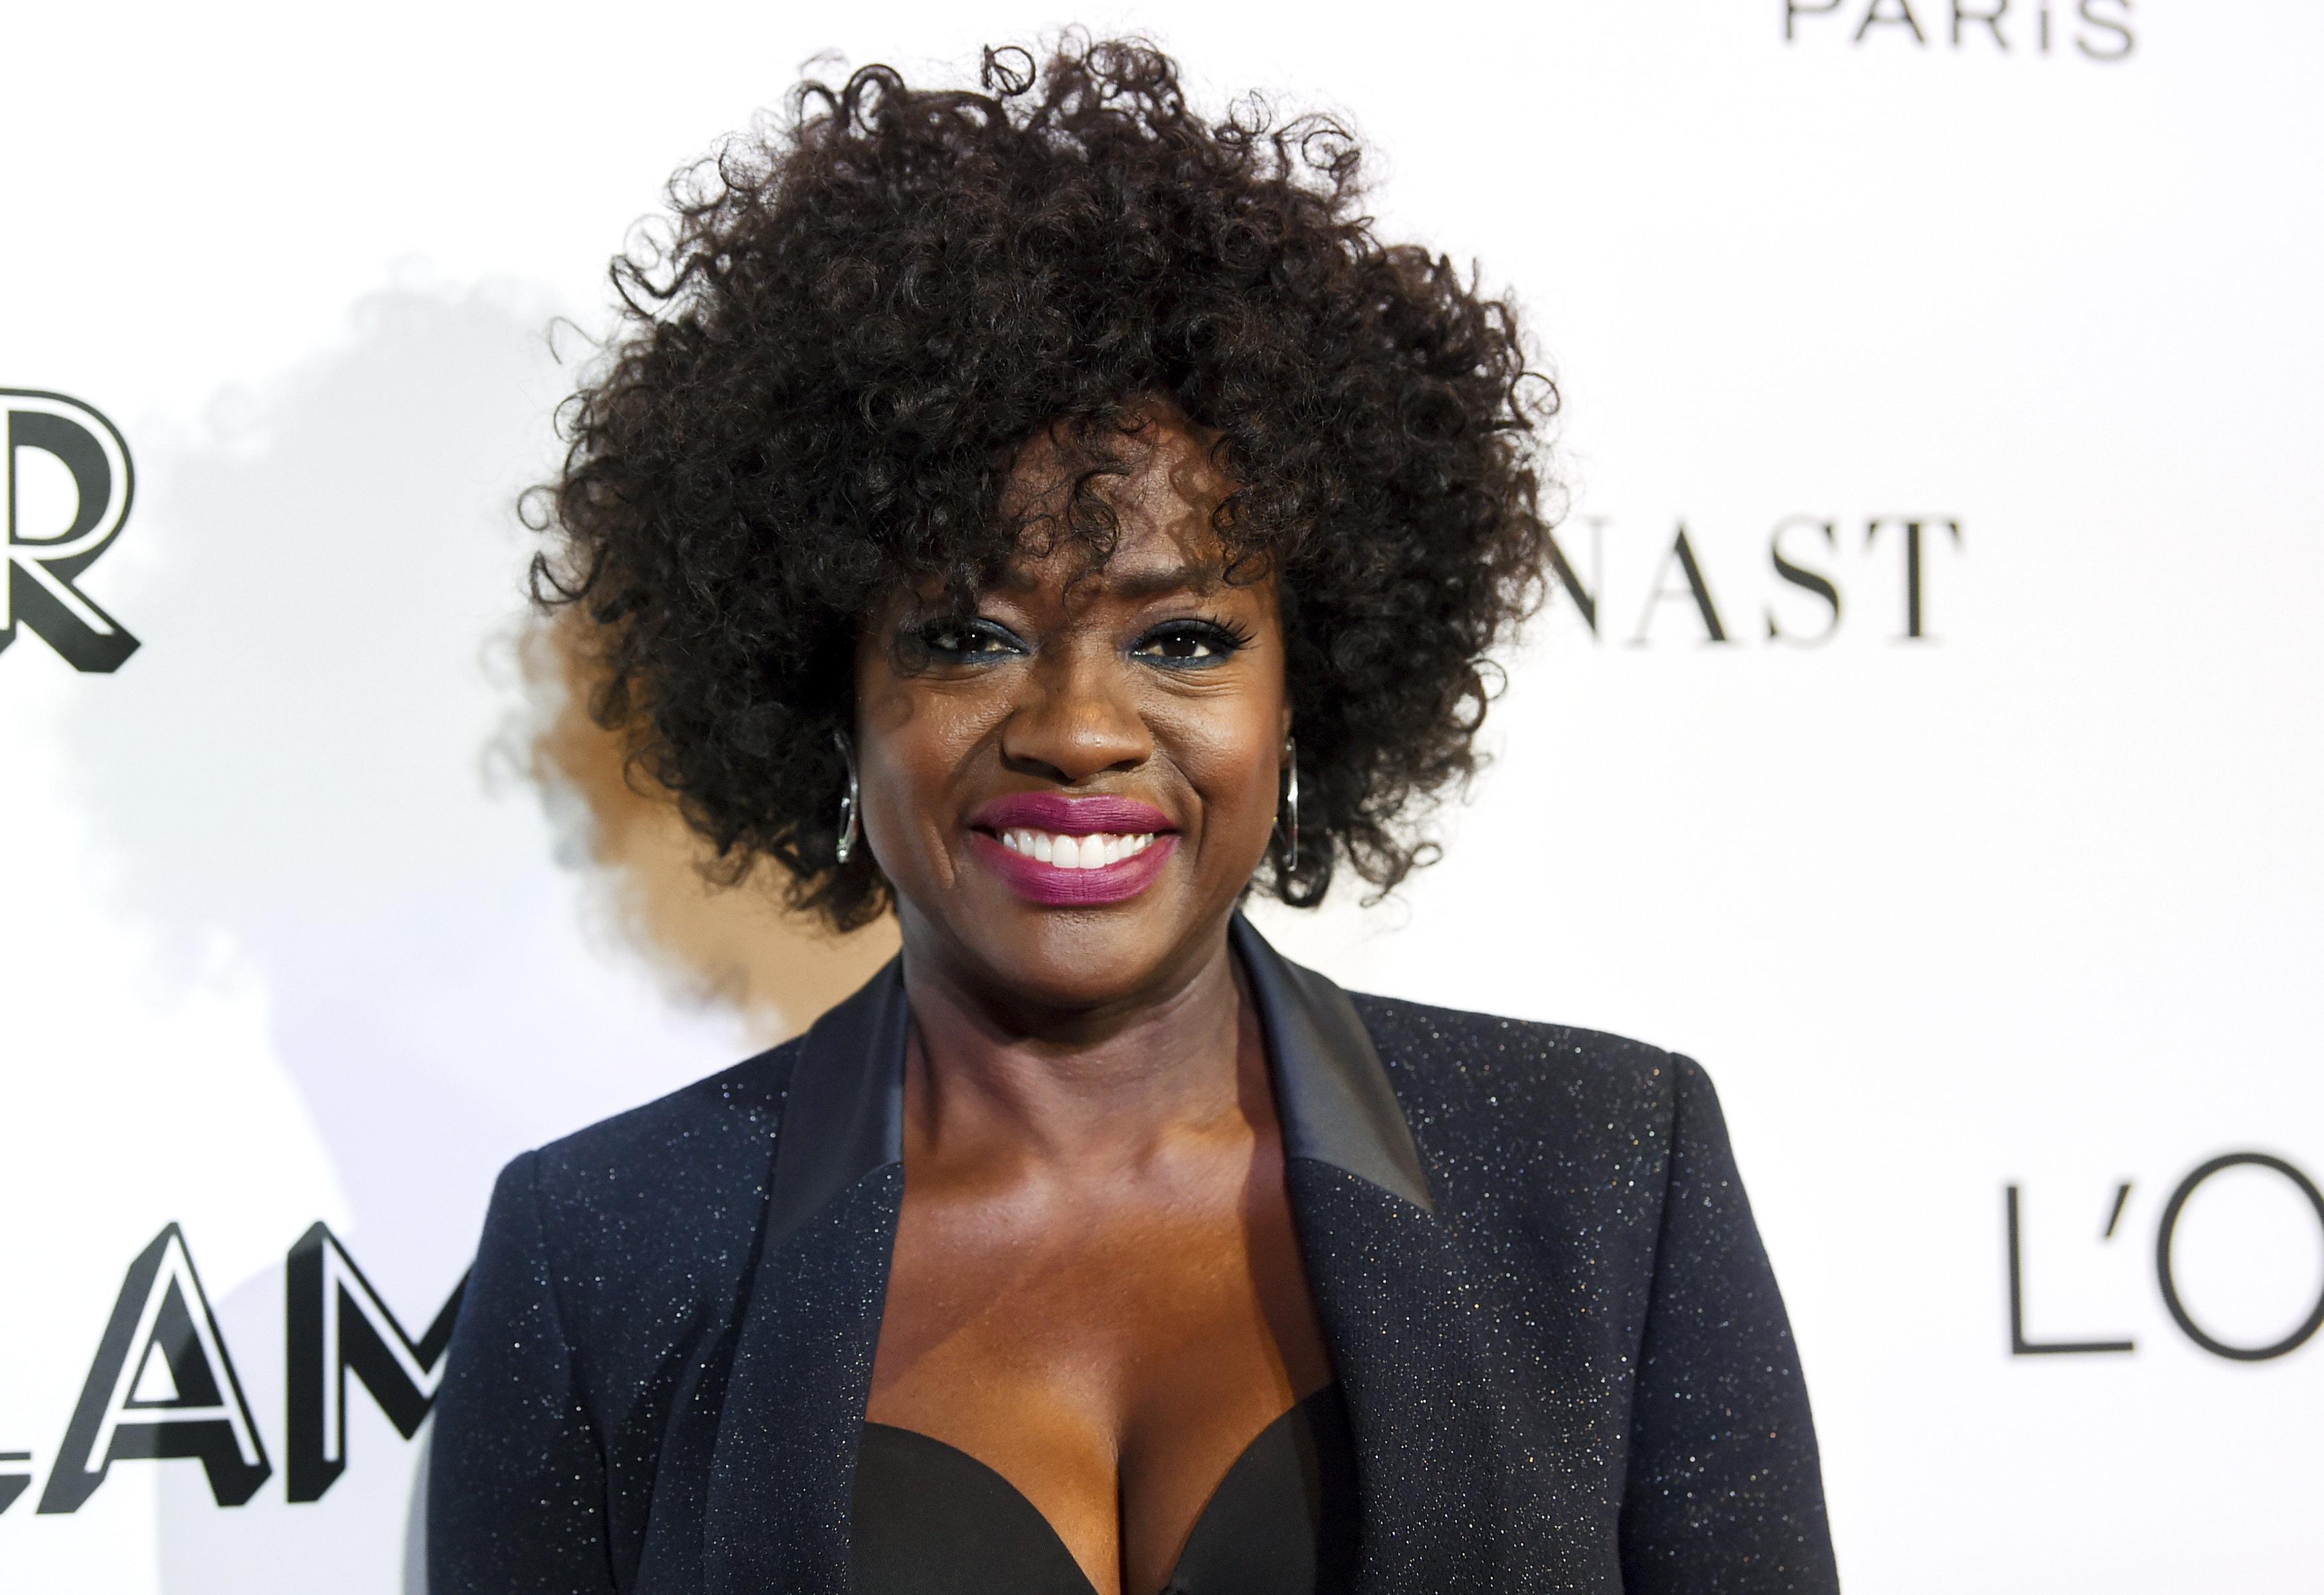 www μαύρες γυναίκες δωρεάν μαύρο σωλήνες μου